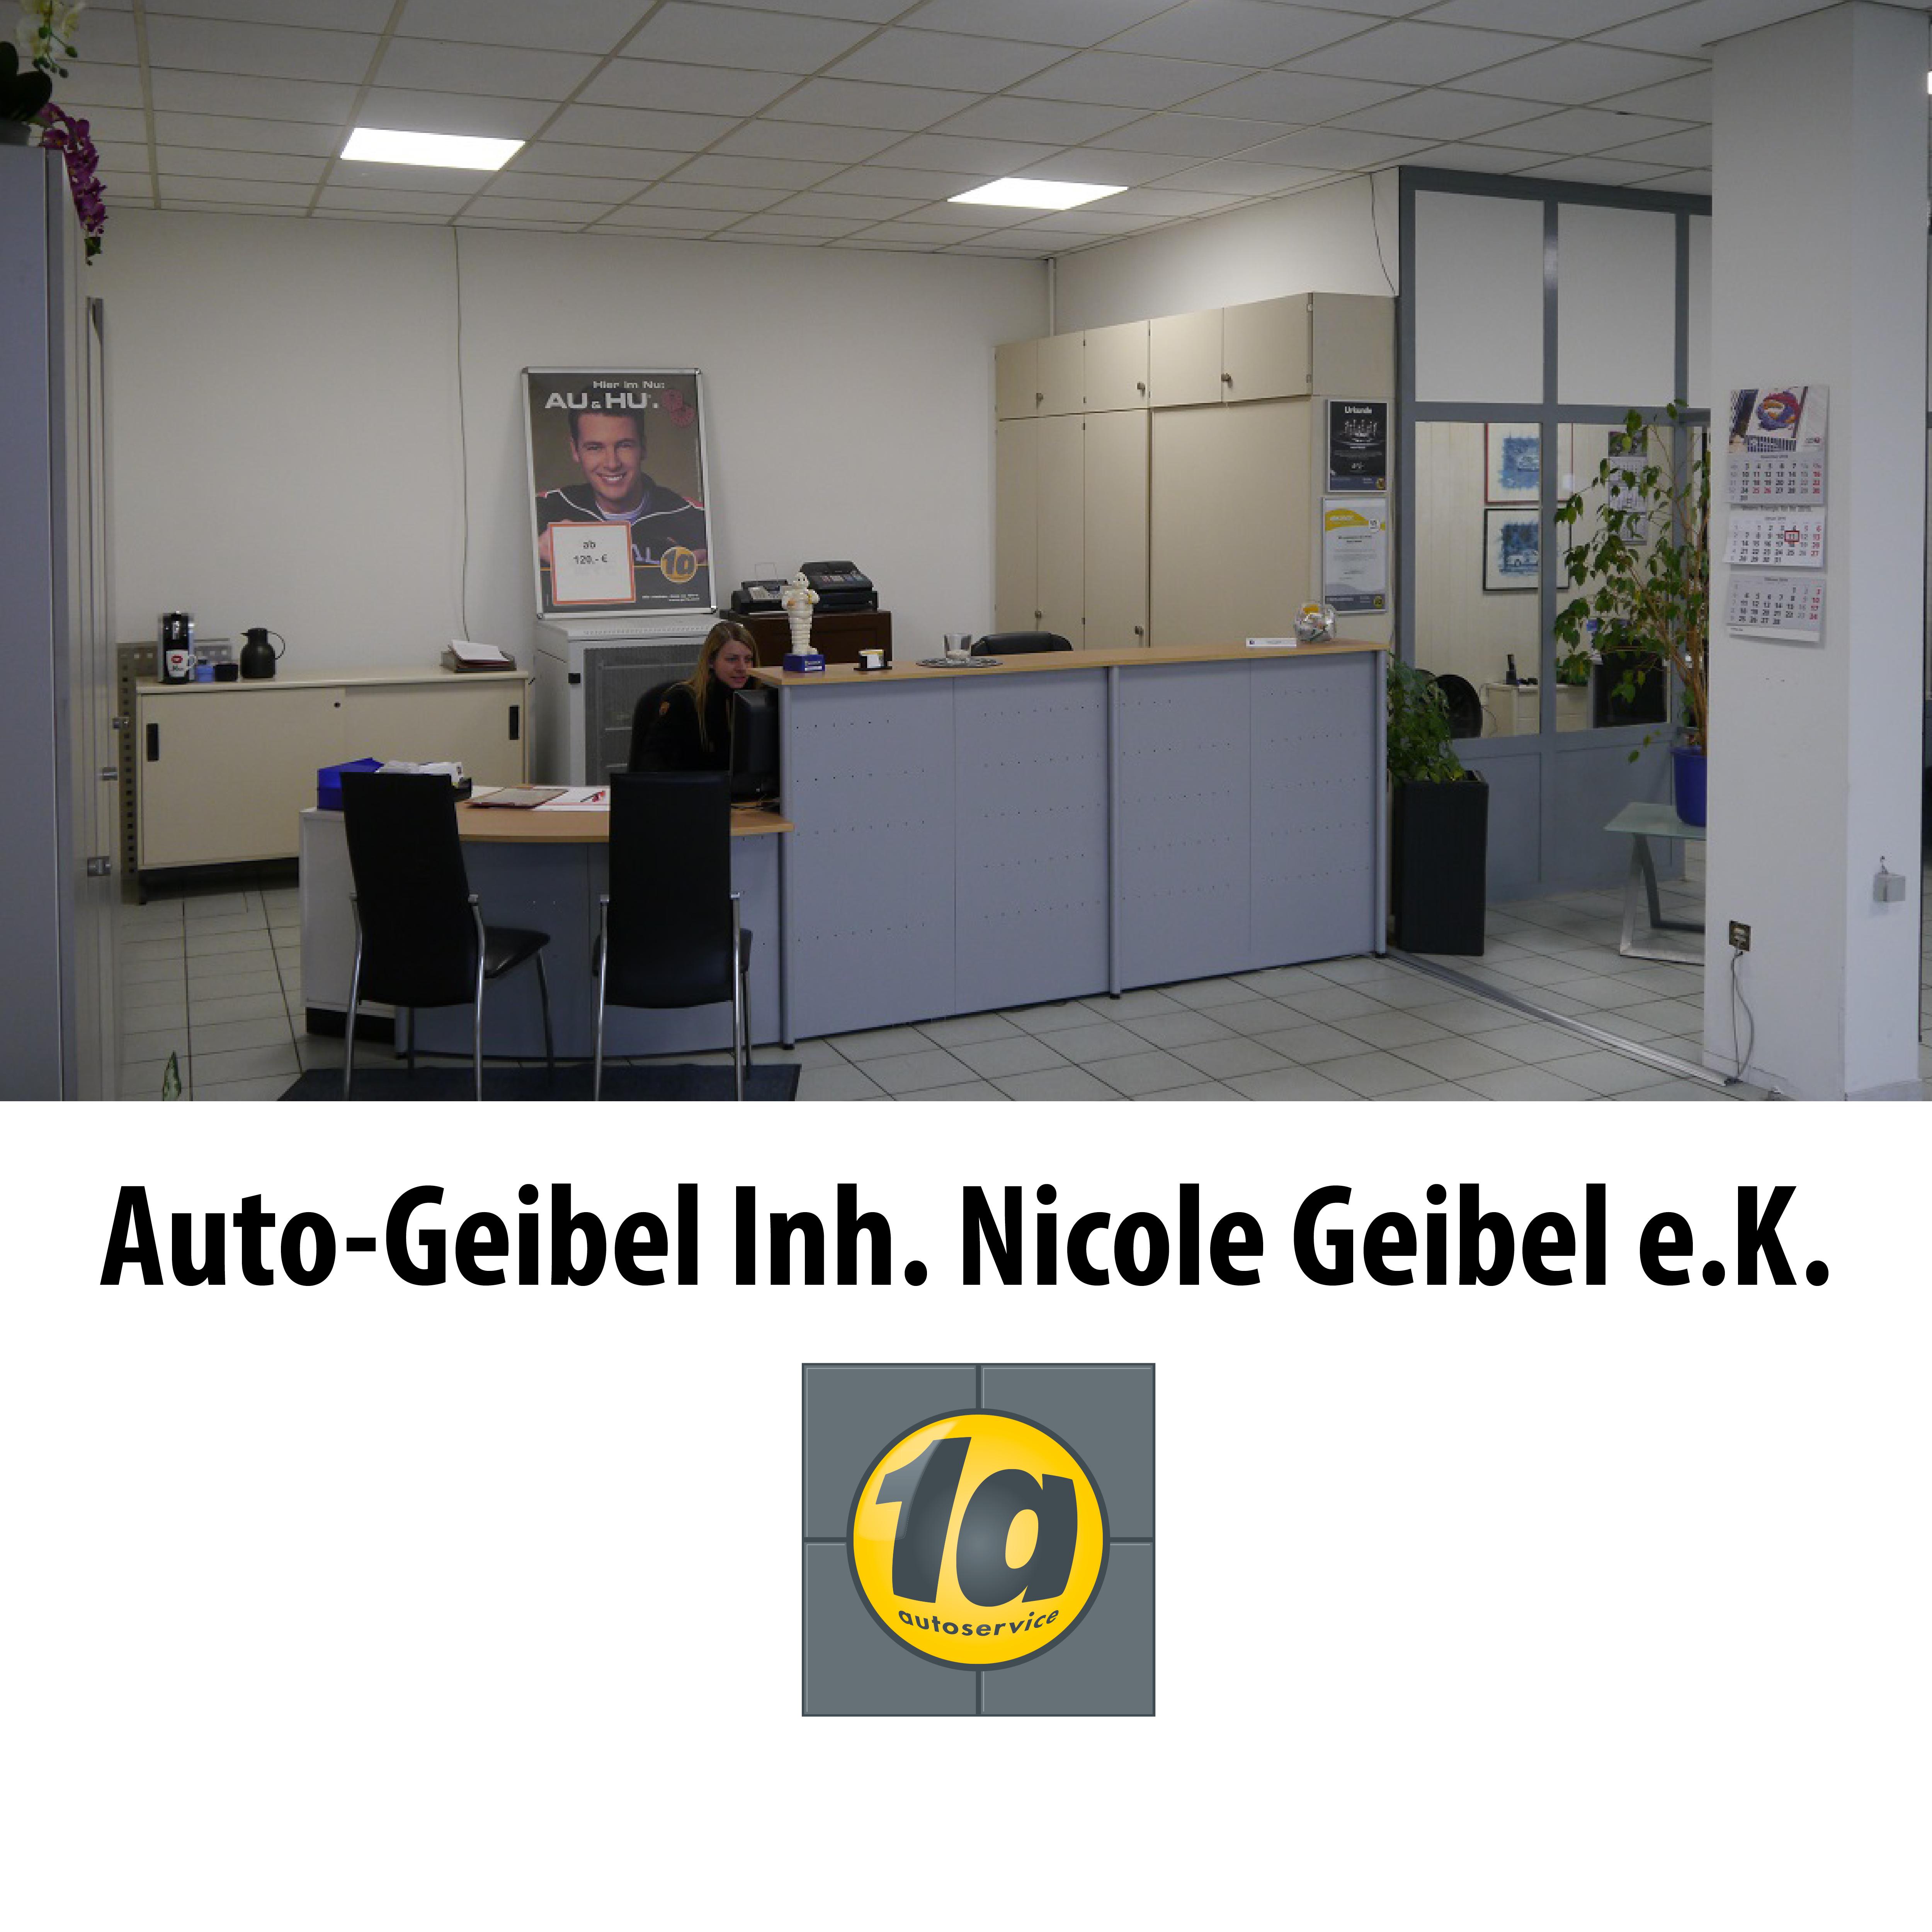 Auto-Geibel Inh. Nicole Geibel e.K.